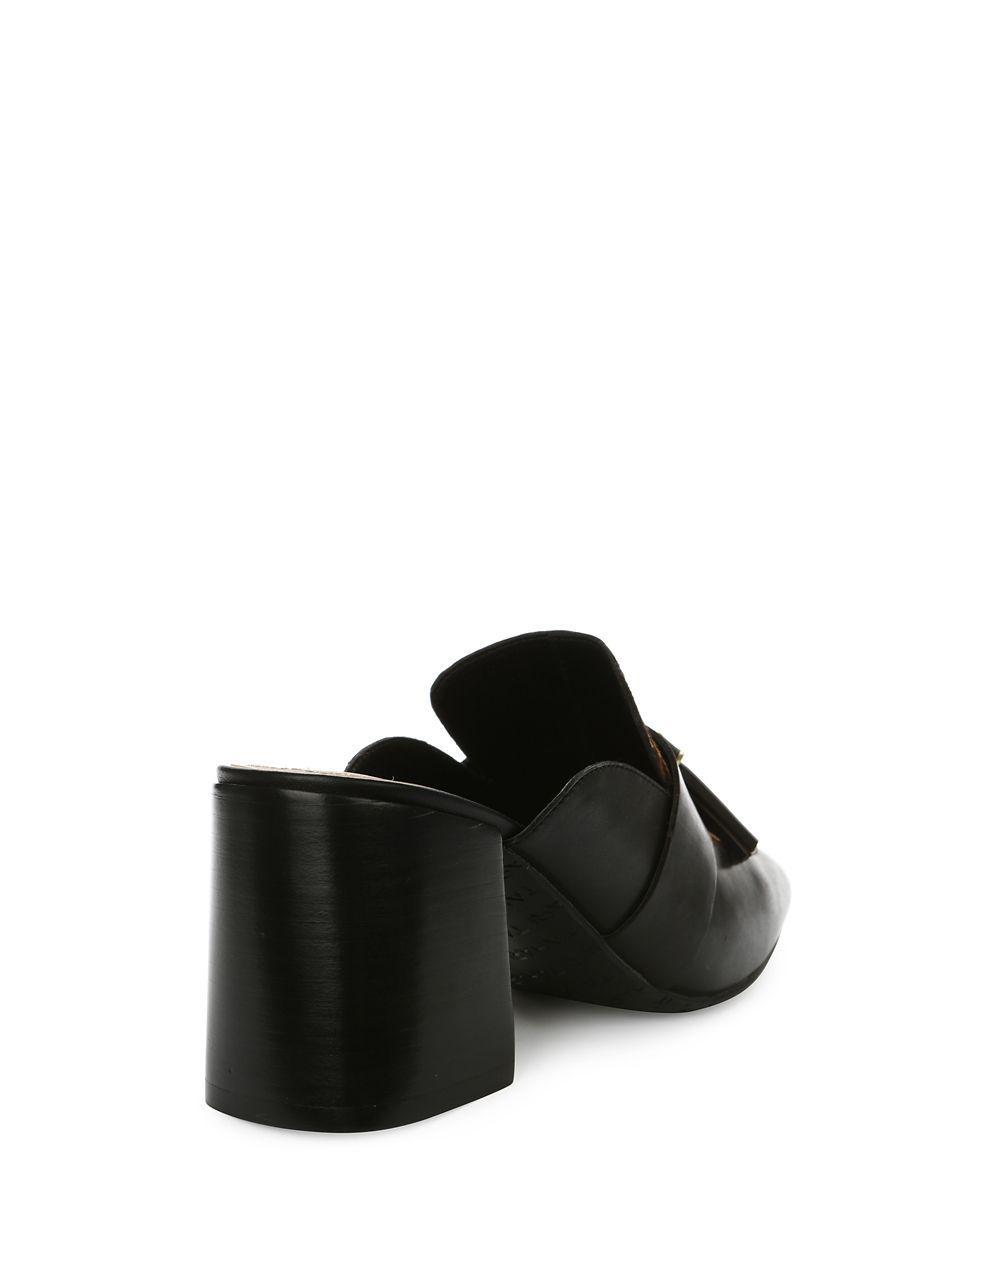 b43bfc089f96 Lyst - Tahari Porter Tassel Suede Calf Hair Mules in Black